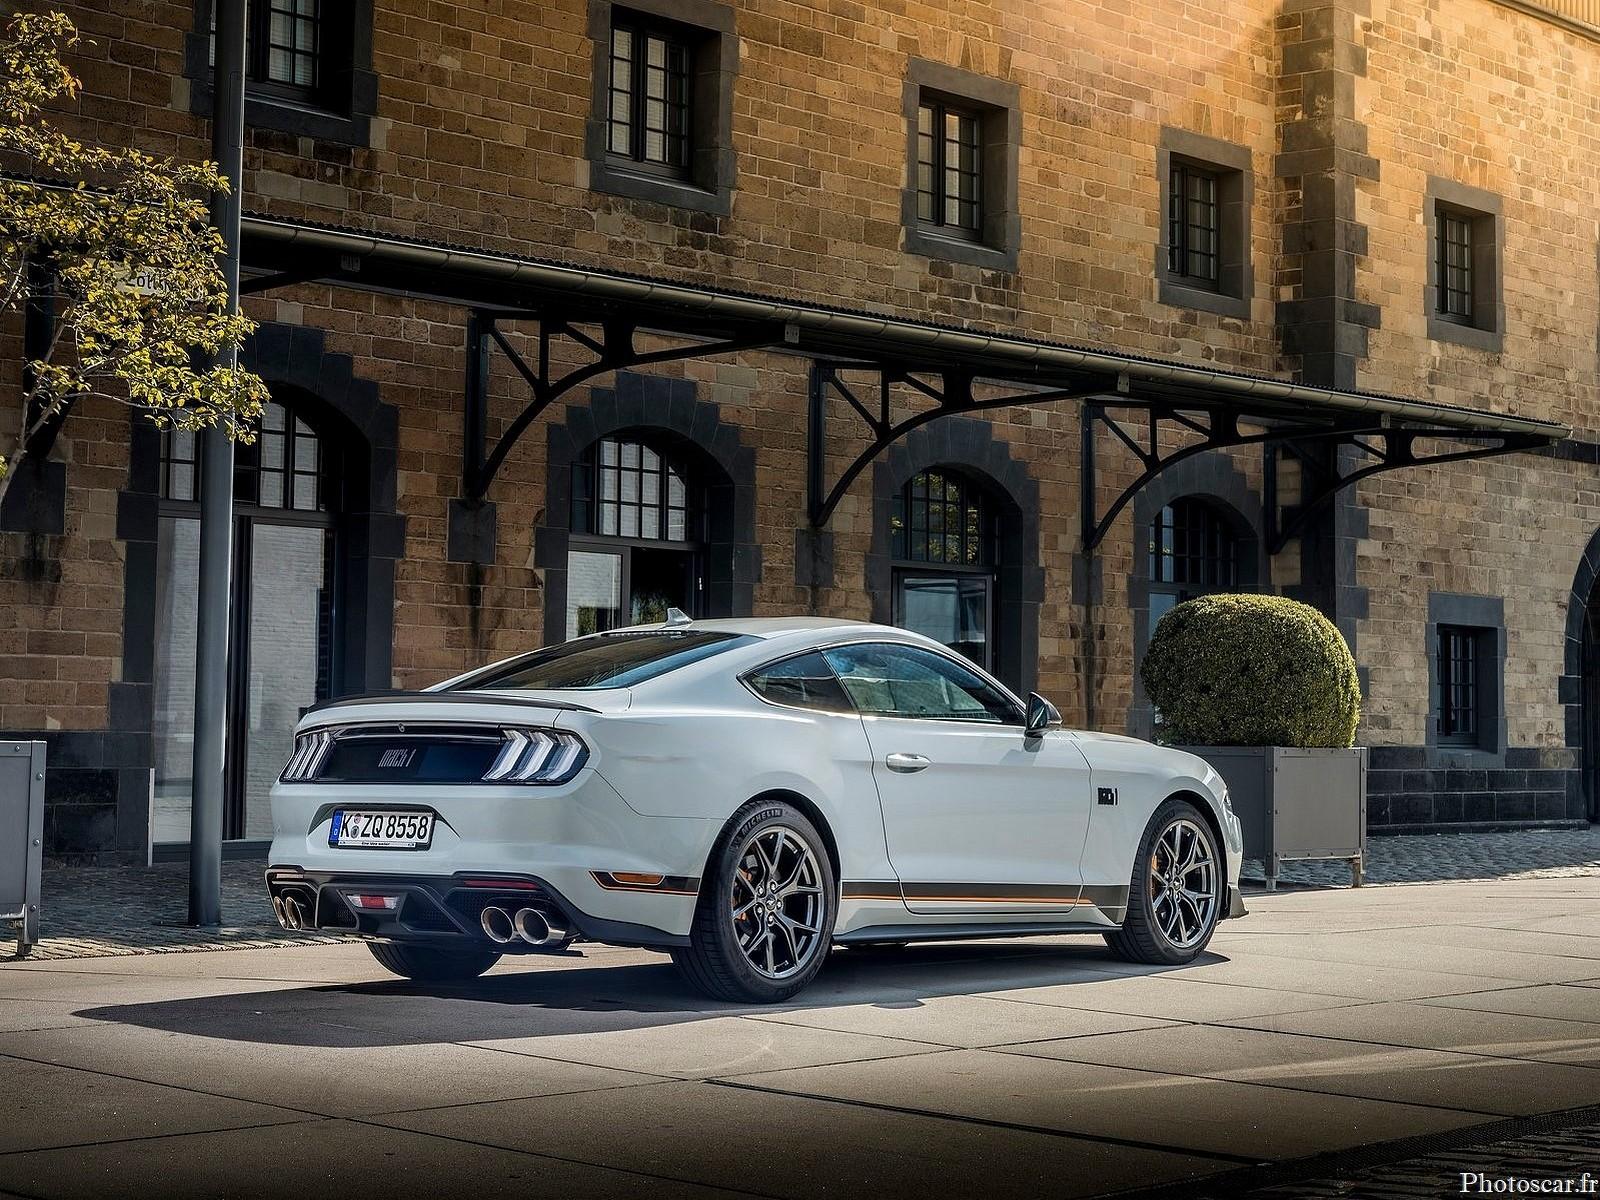 Ford Mustang Mach 1 Version EU 2021